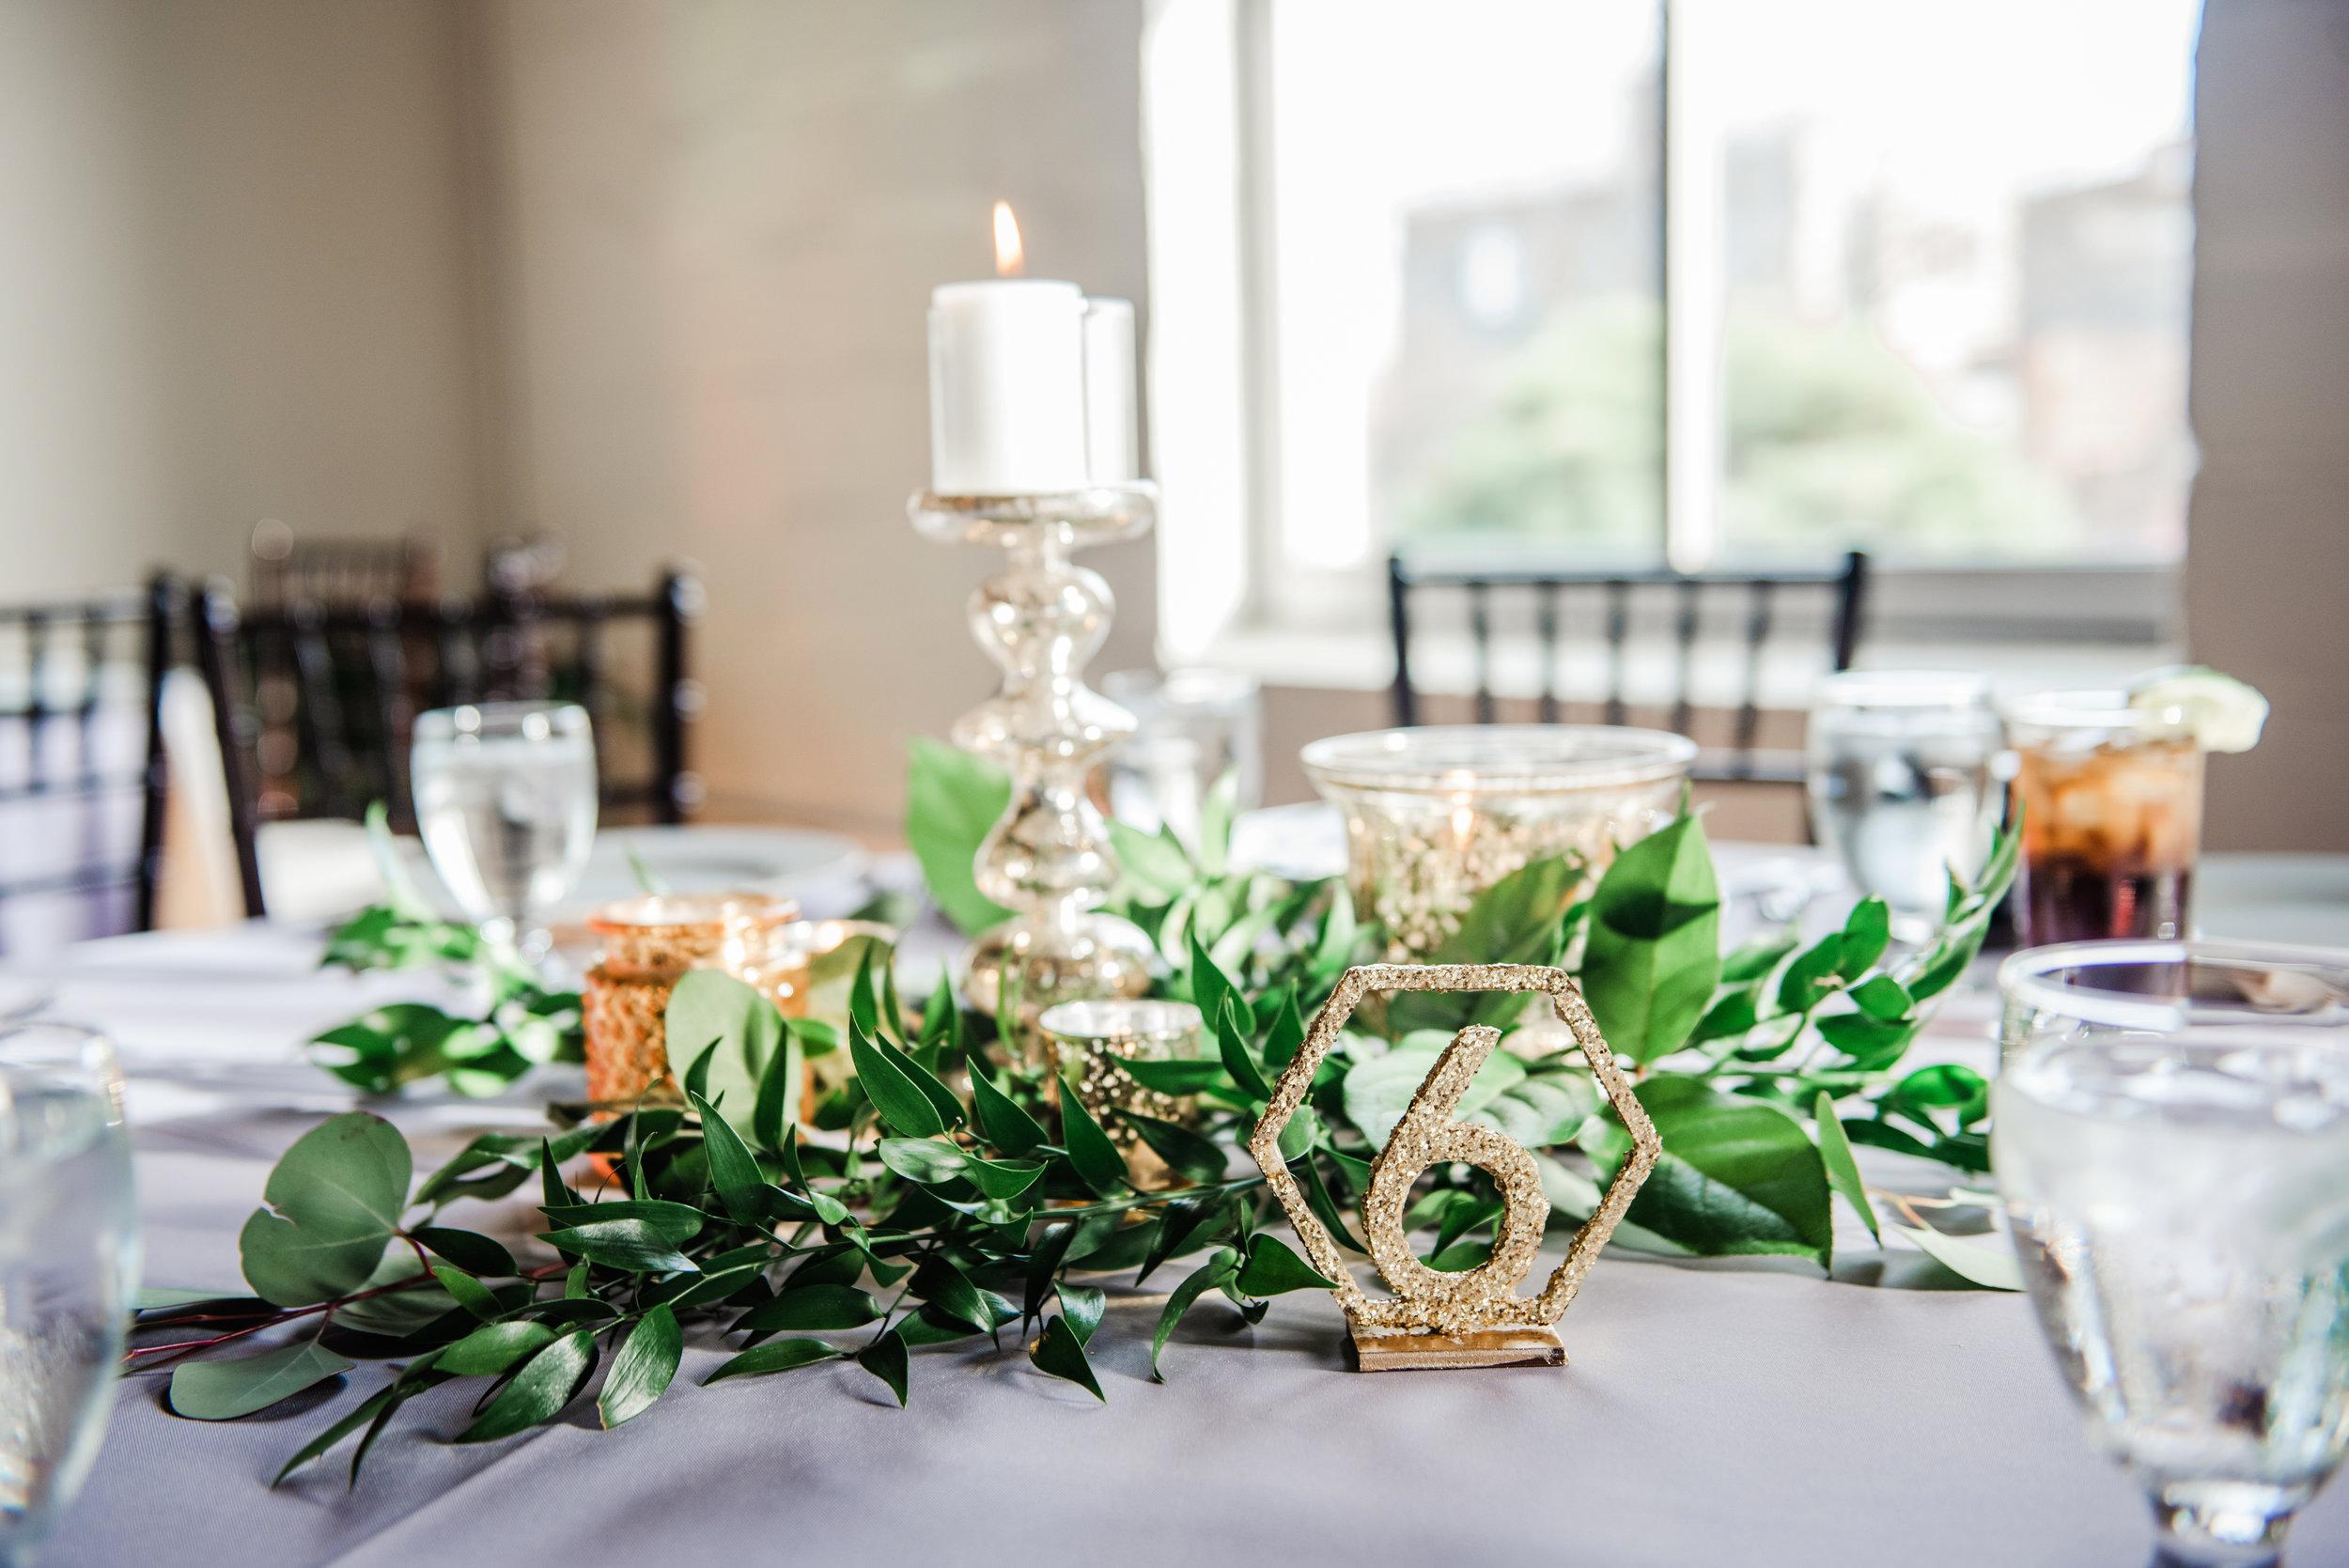 The_Arbor_Loft_Rochester_Wedding_JILL_STUDIO_Rochester_NY_Photographer_174005.jpg